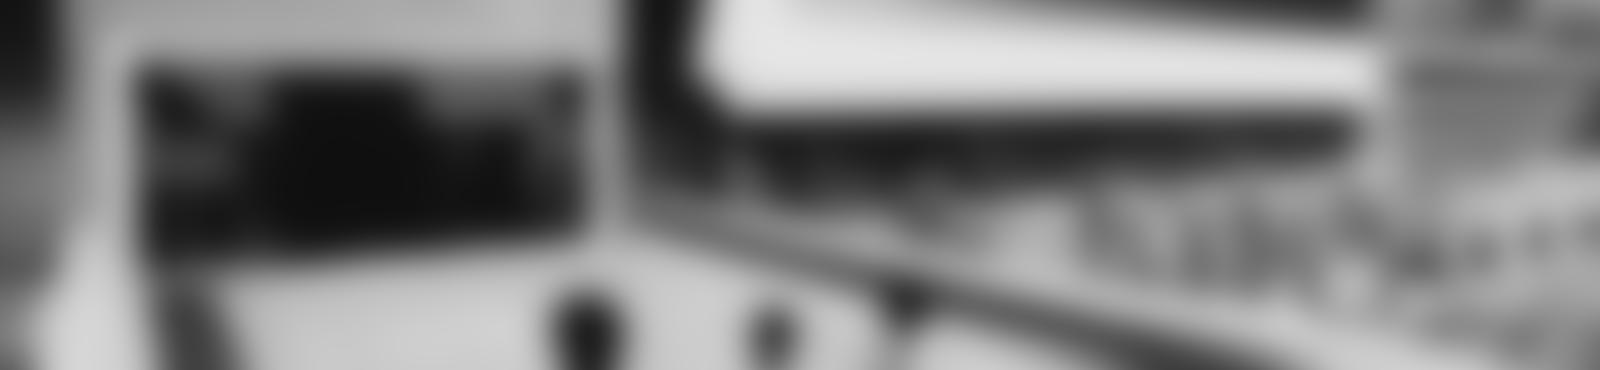 Blurred 057cdbfa 473e 41f8 8444 bf3046069bf2